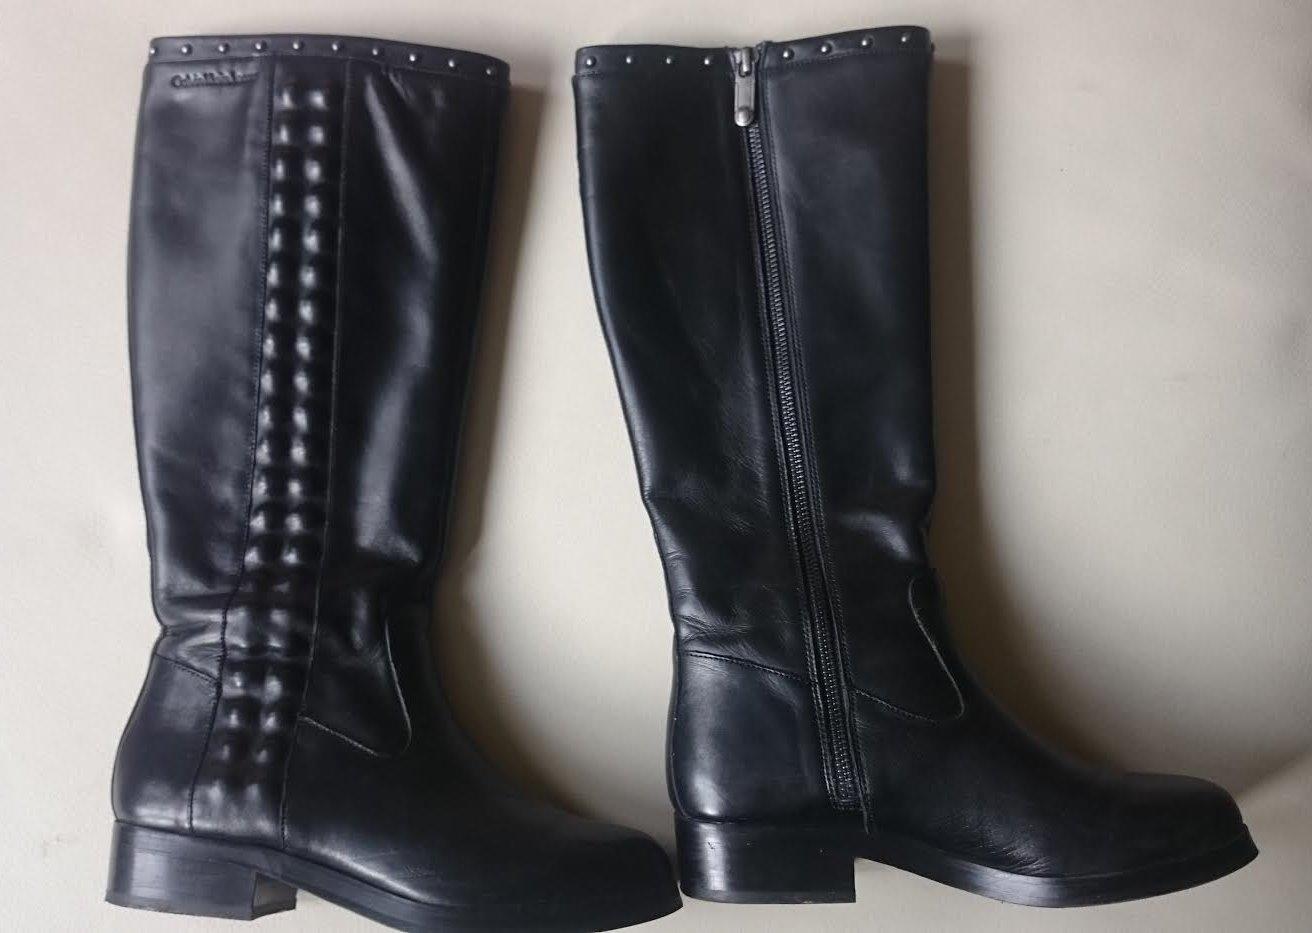 d21e5f177d Čierne kožené čižmy calvin klein